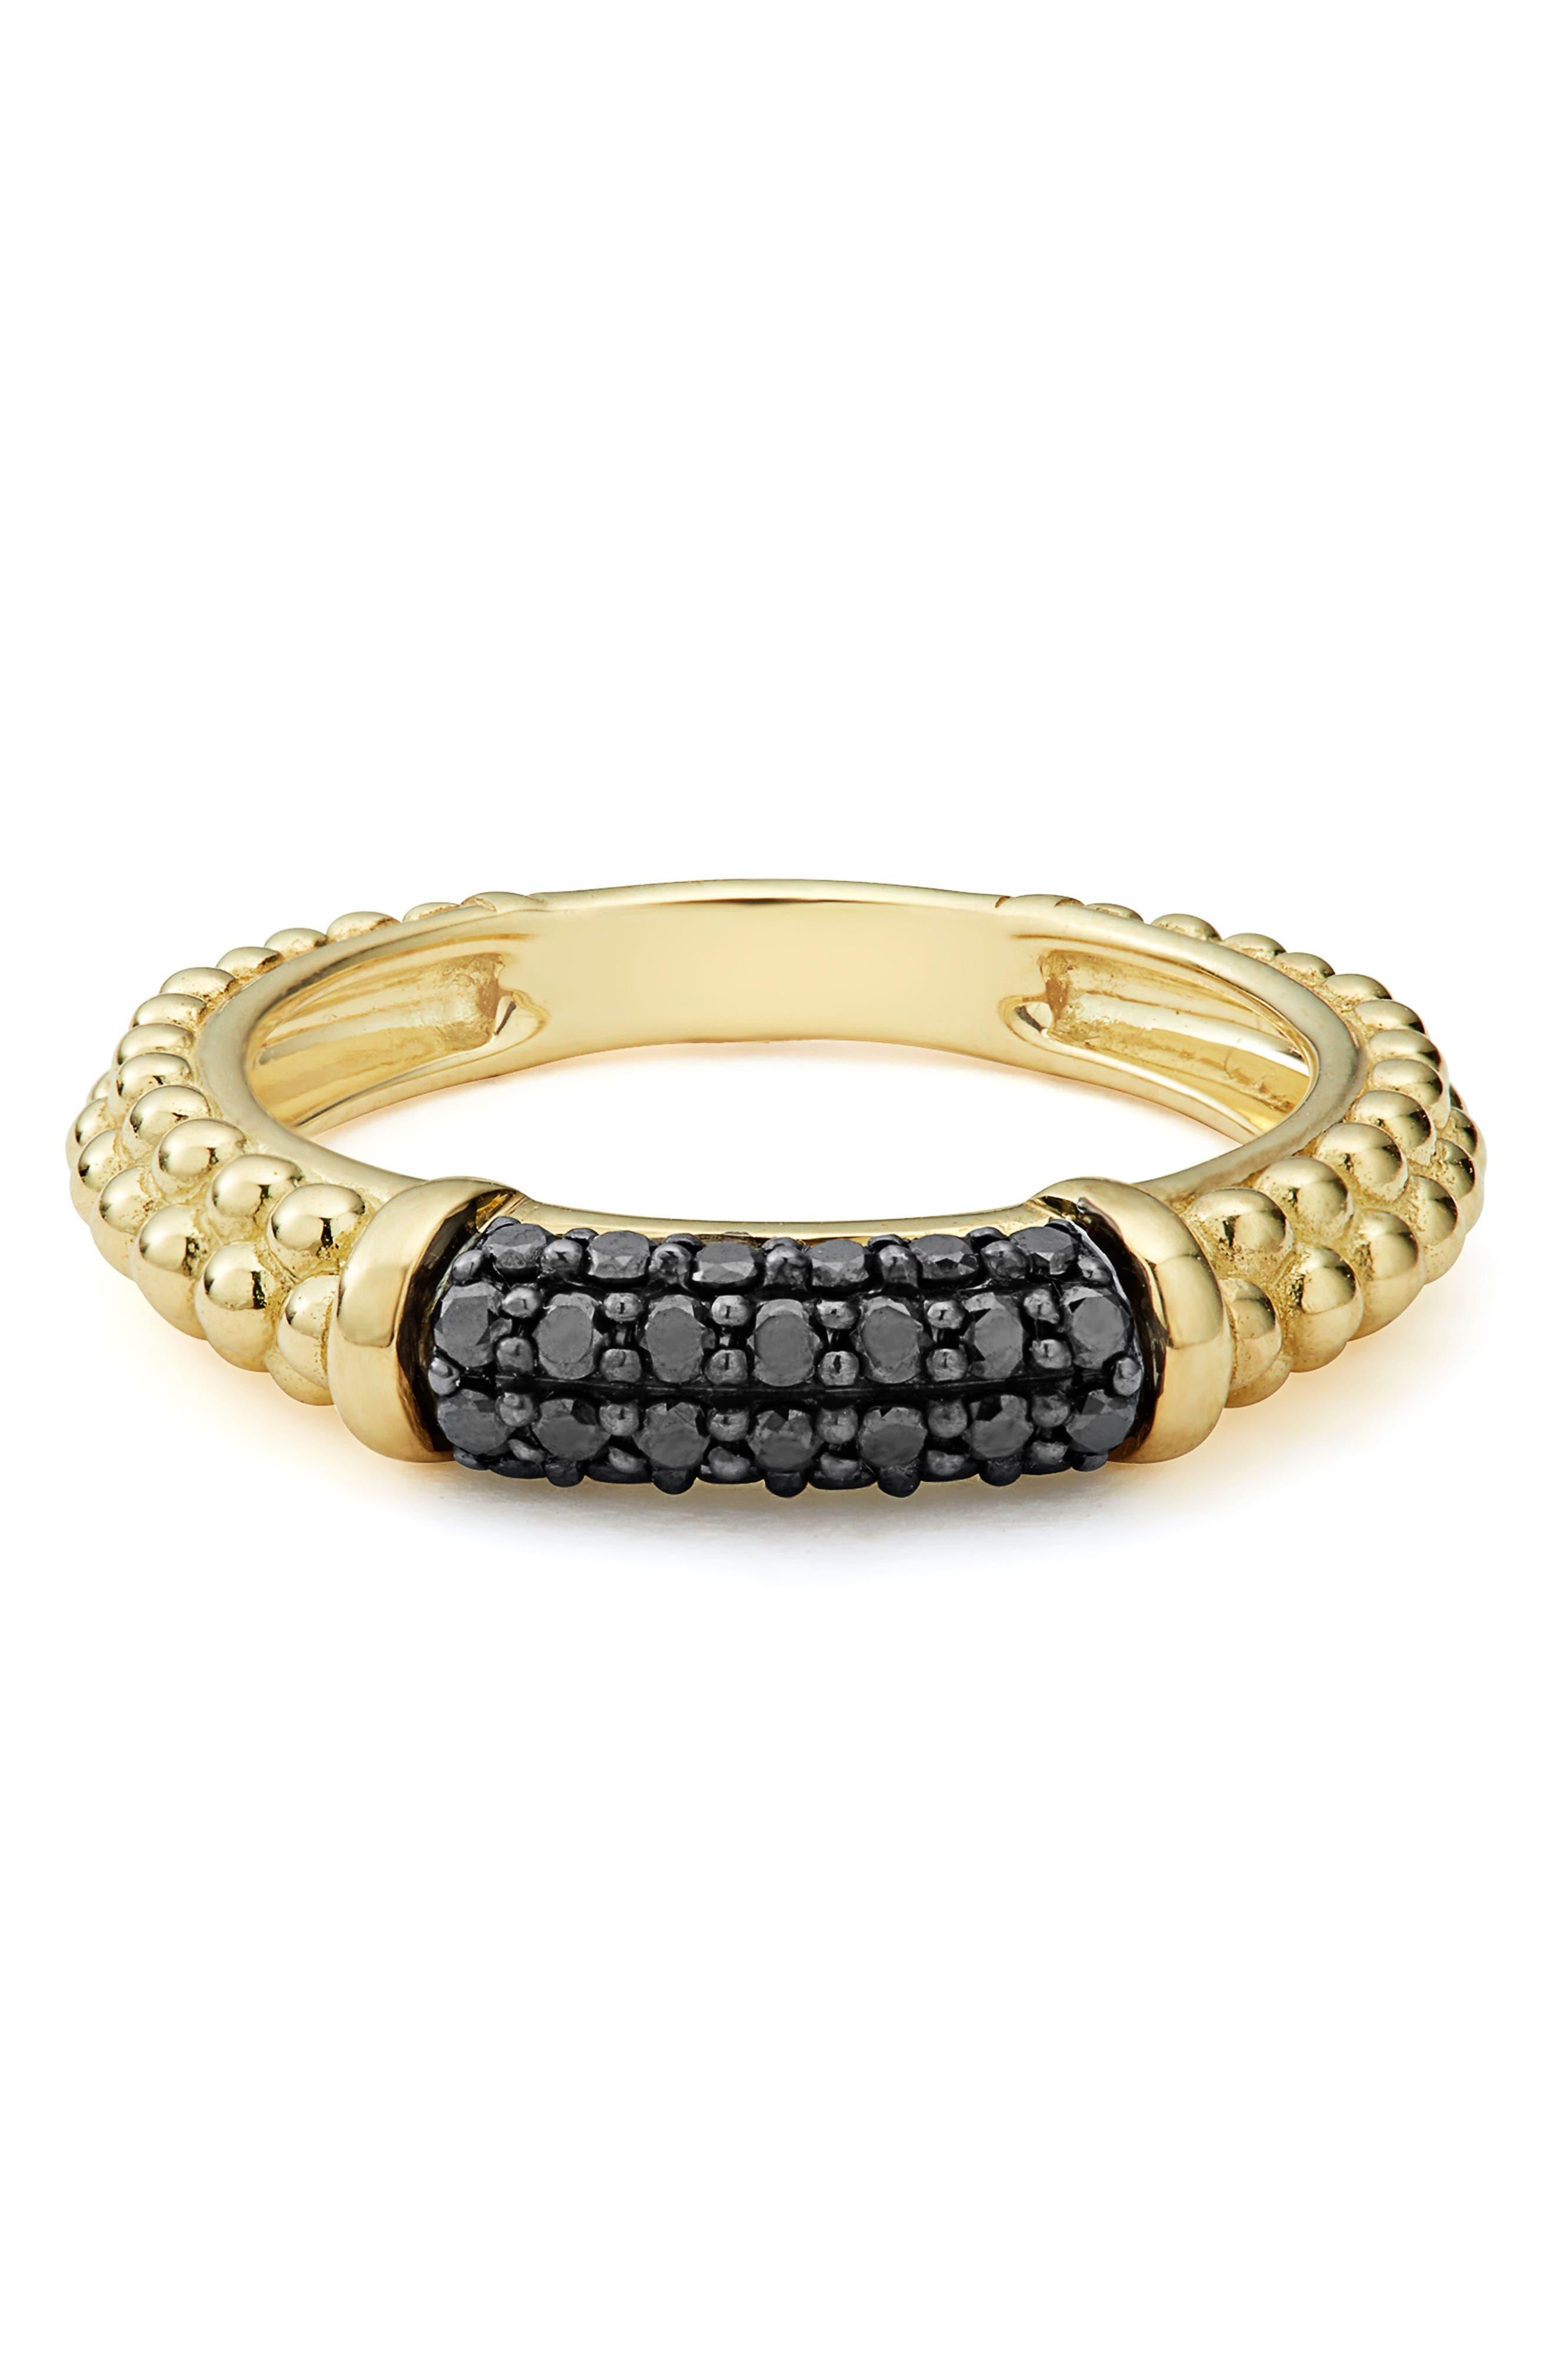 Gold & Black Caviar Black Diamond Pavé Stacking Ring,                             Alternate thumbnail 4, color,                             GOLD